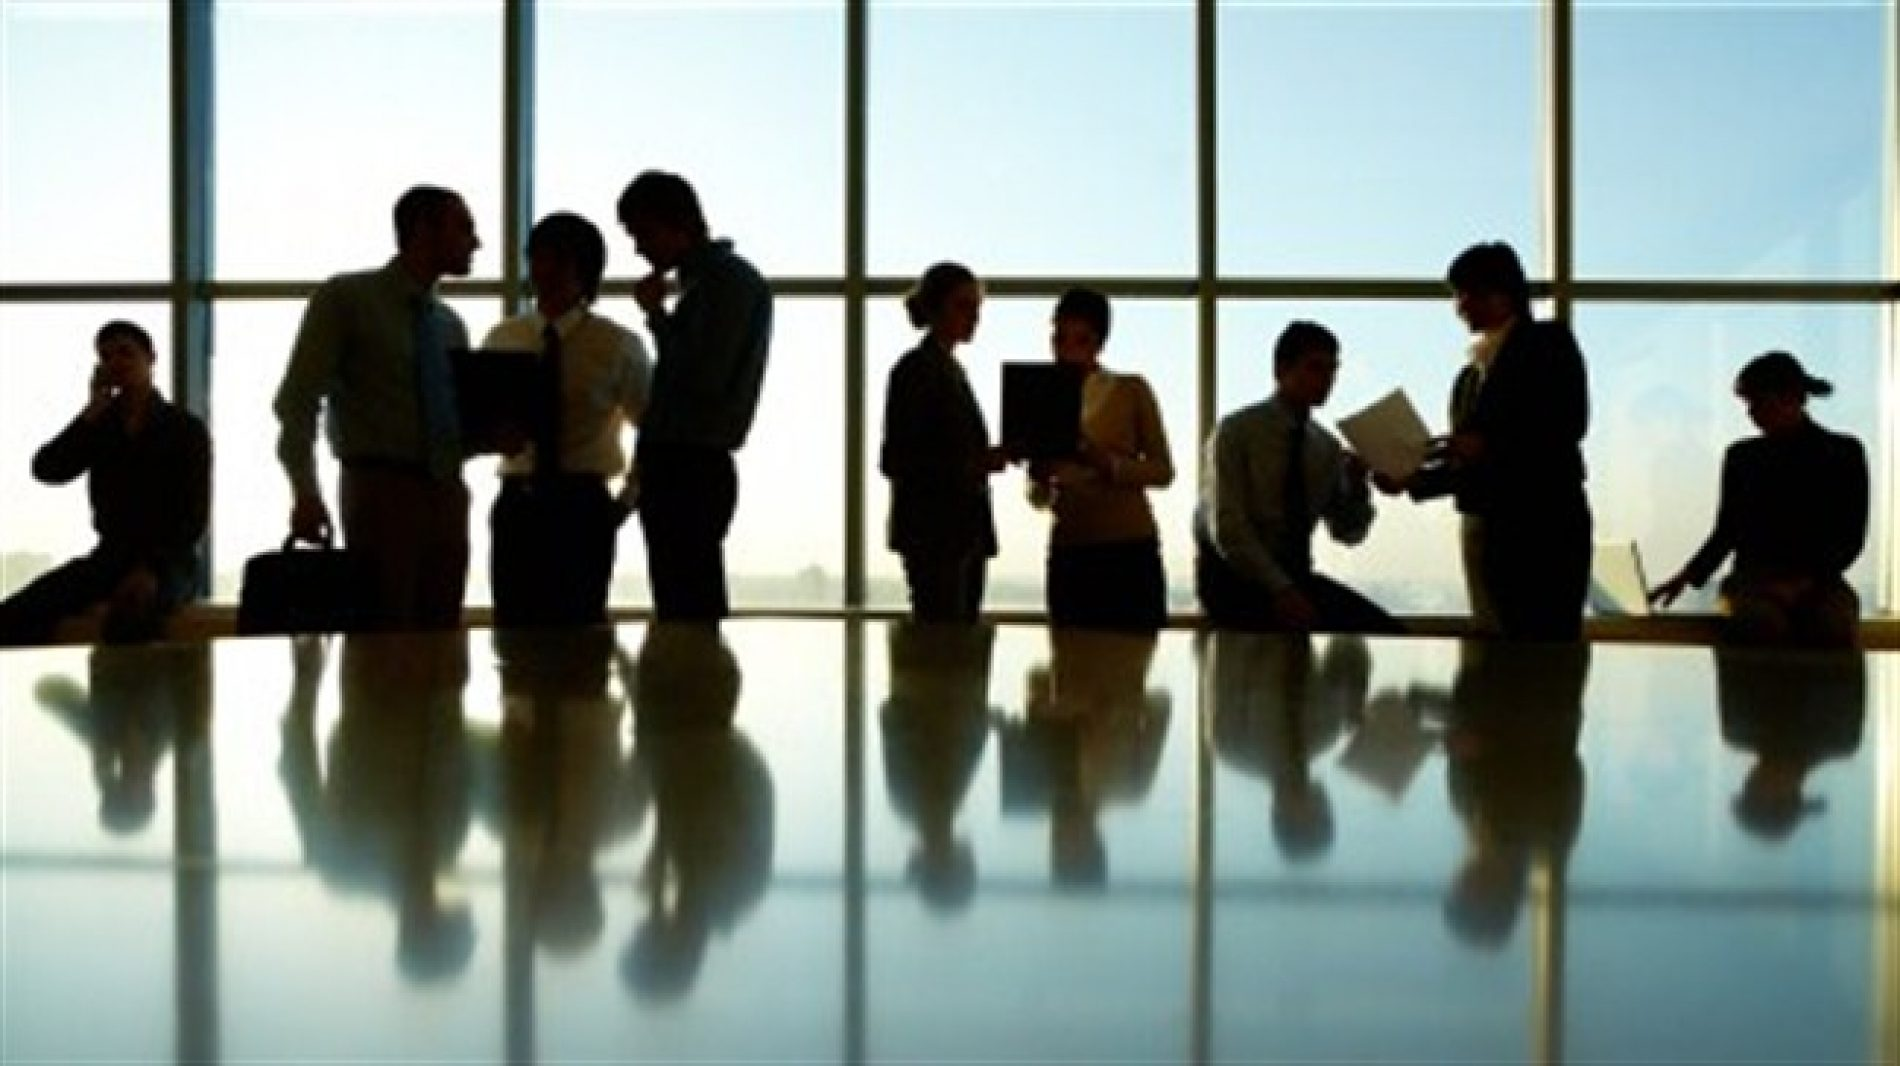 Developments and Best Practices in Informal Employment